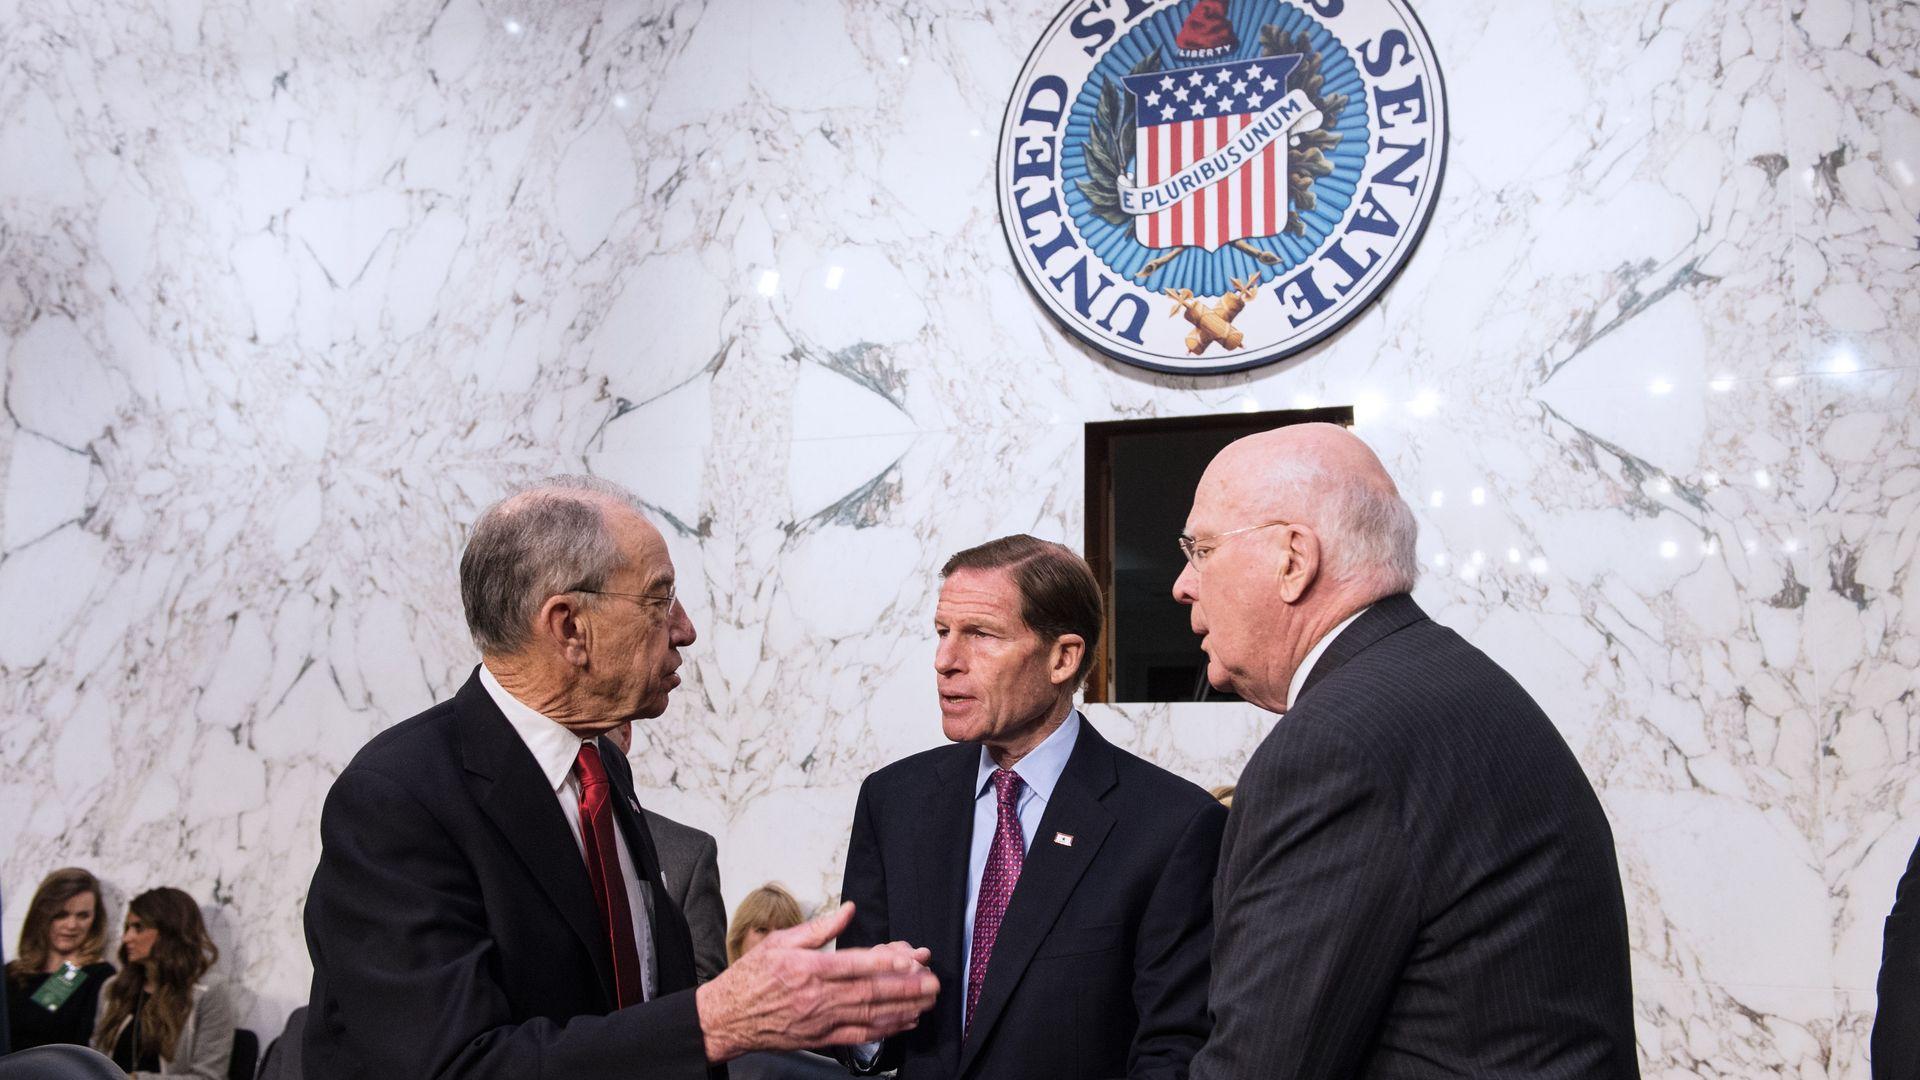 Senators Want Answers On Idea Website >> Senators Want Answers From Fbi And White House On Security